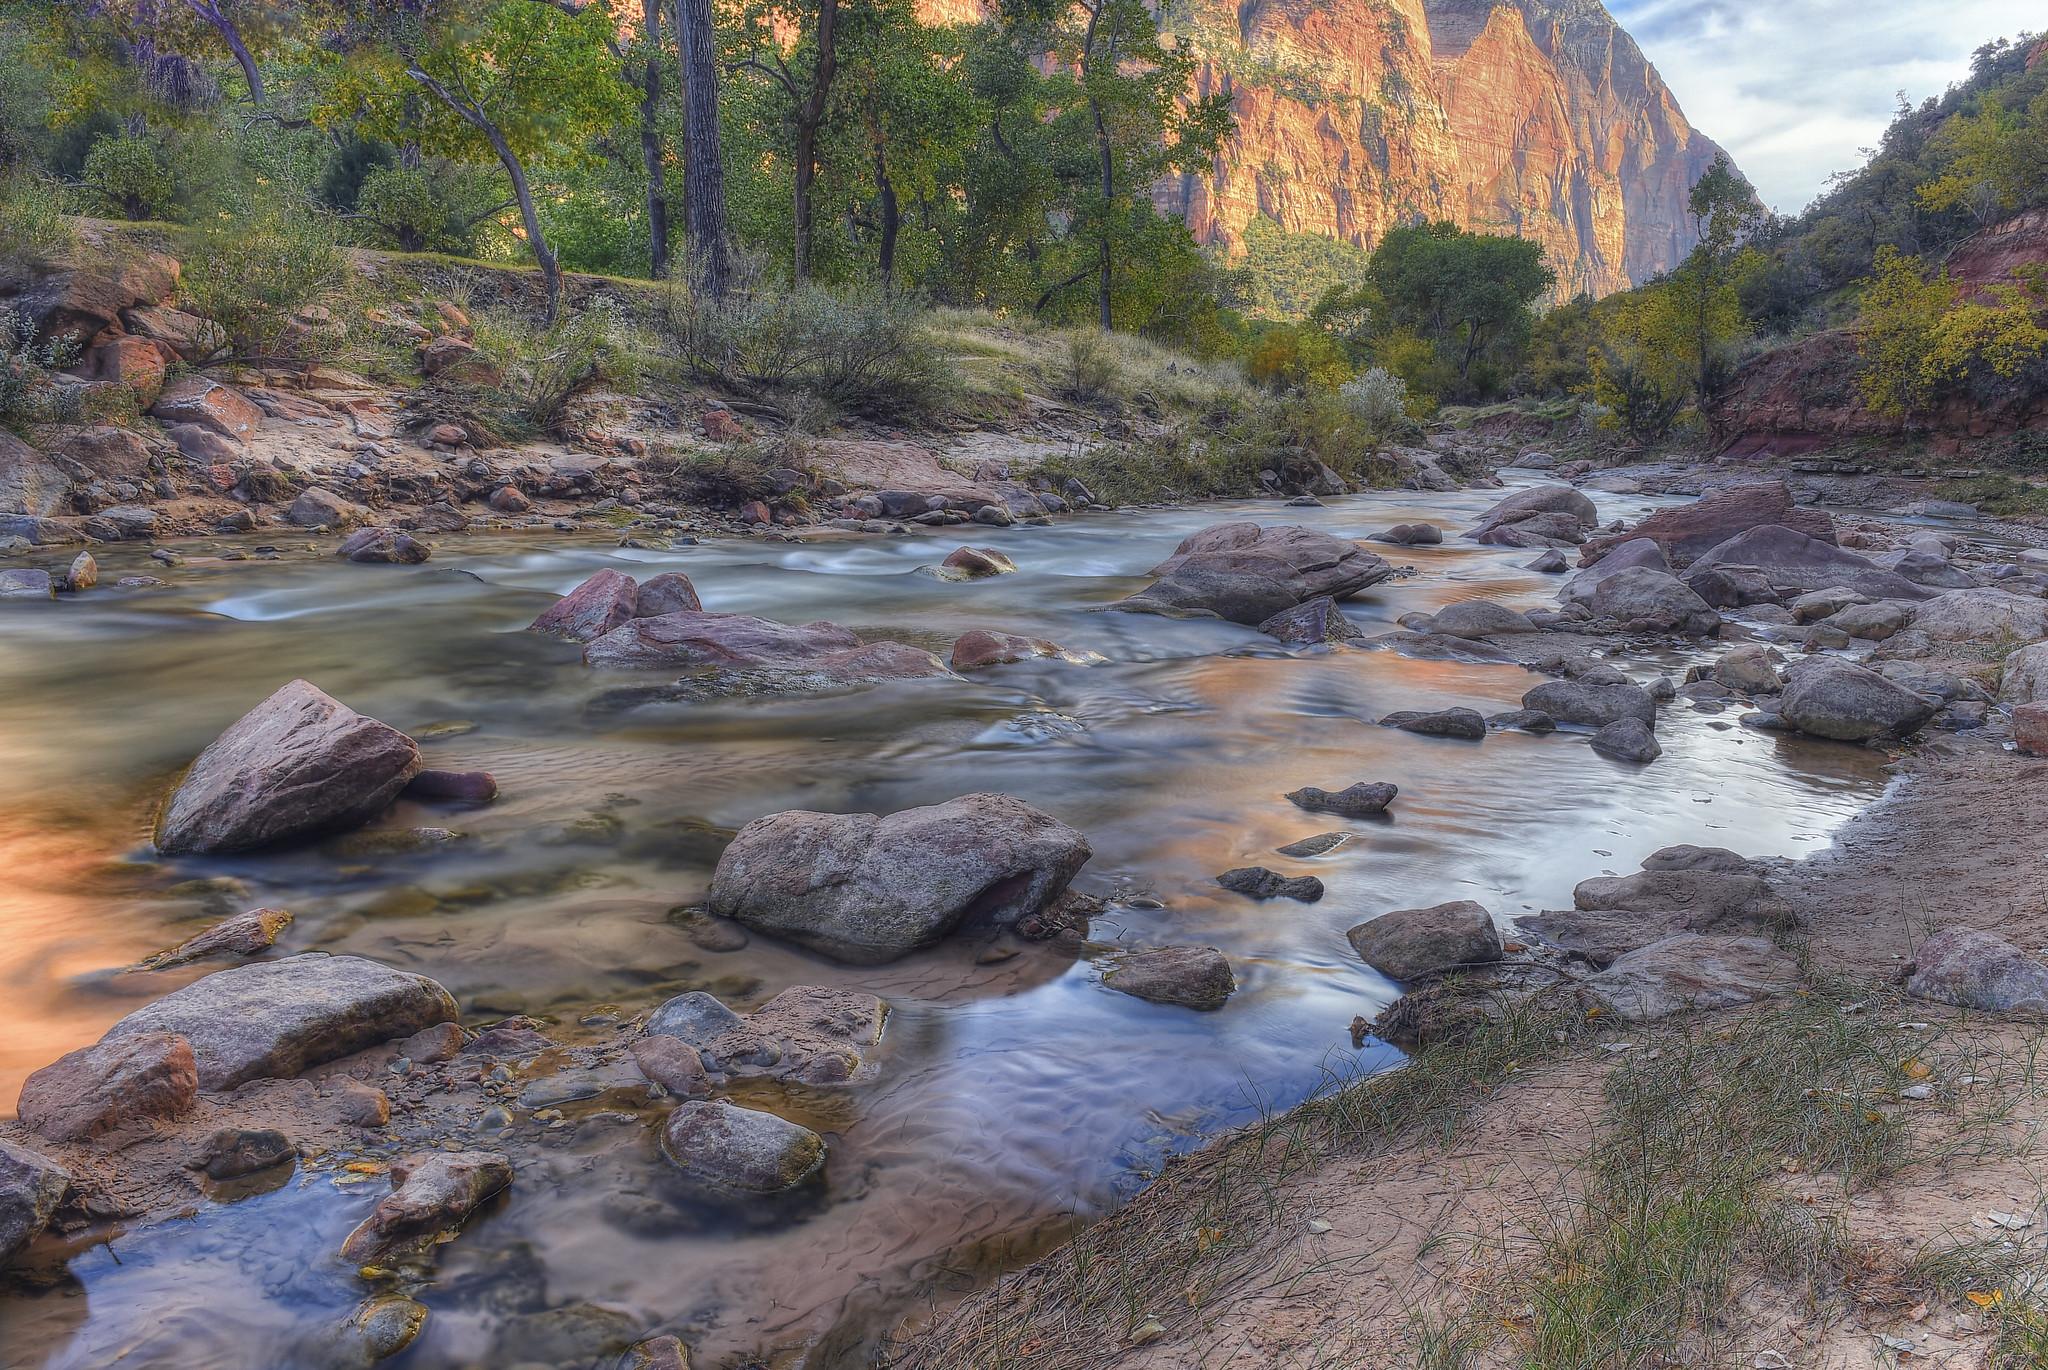 The Virgin River, Zion National Park